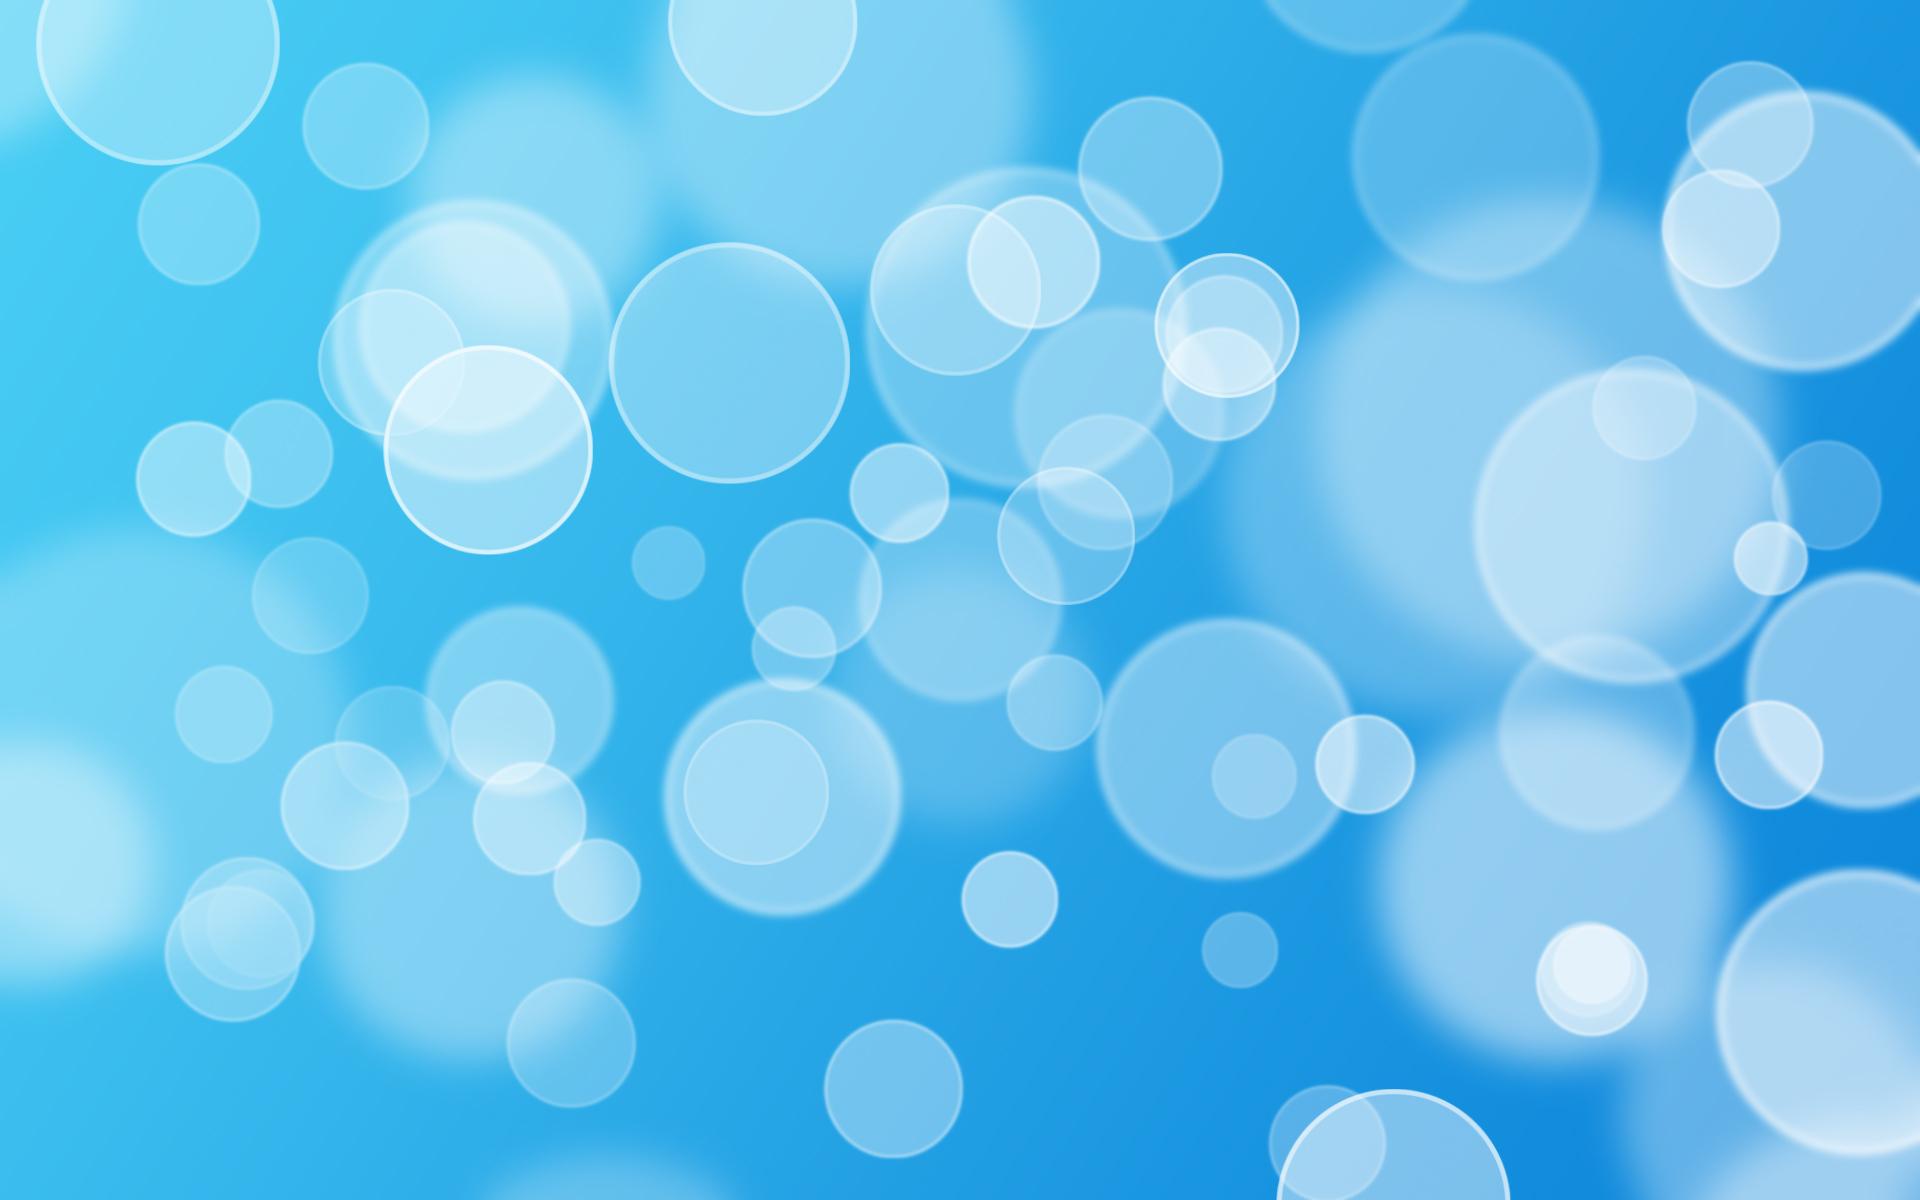 Bubbles · Bubbles · Bubbles · Bubbles · Bubbles · Bubbles